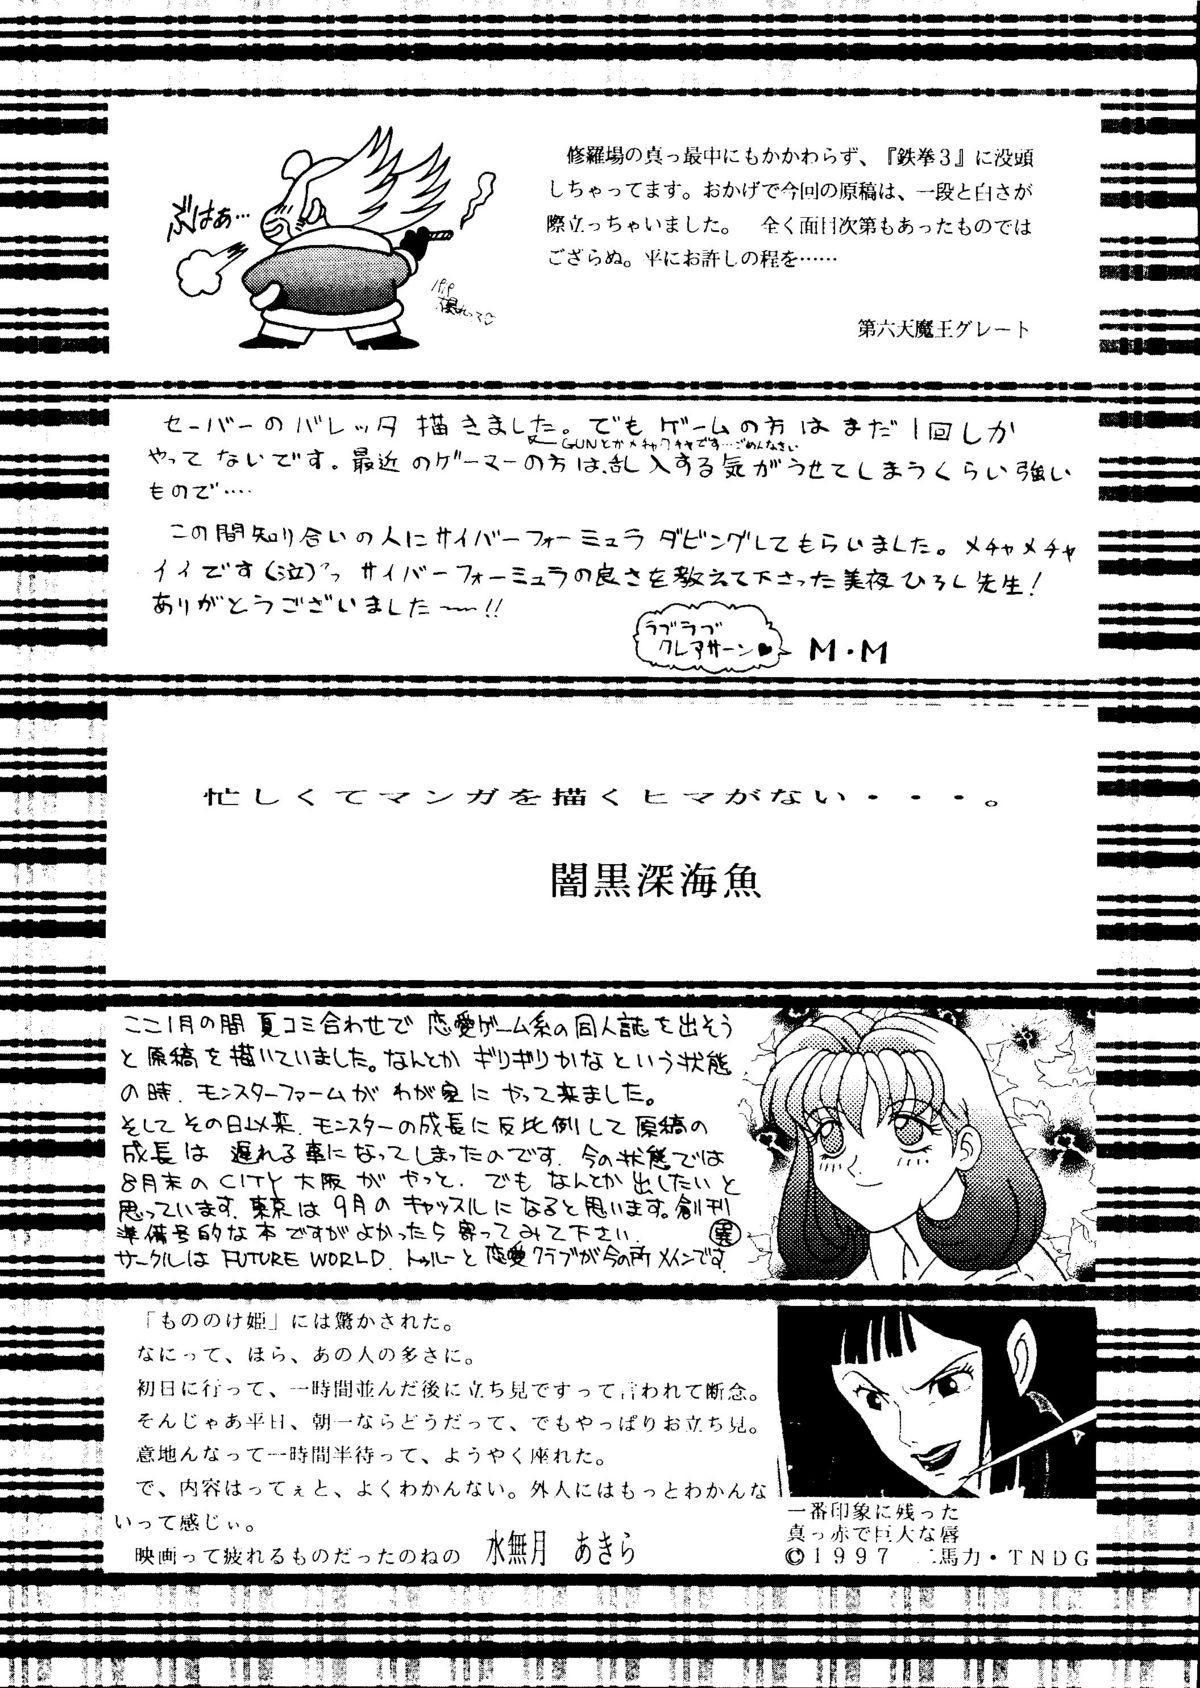 Okachimentaiko Tengo 101